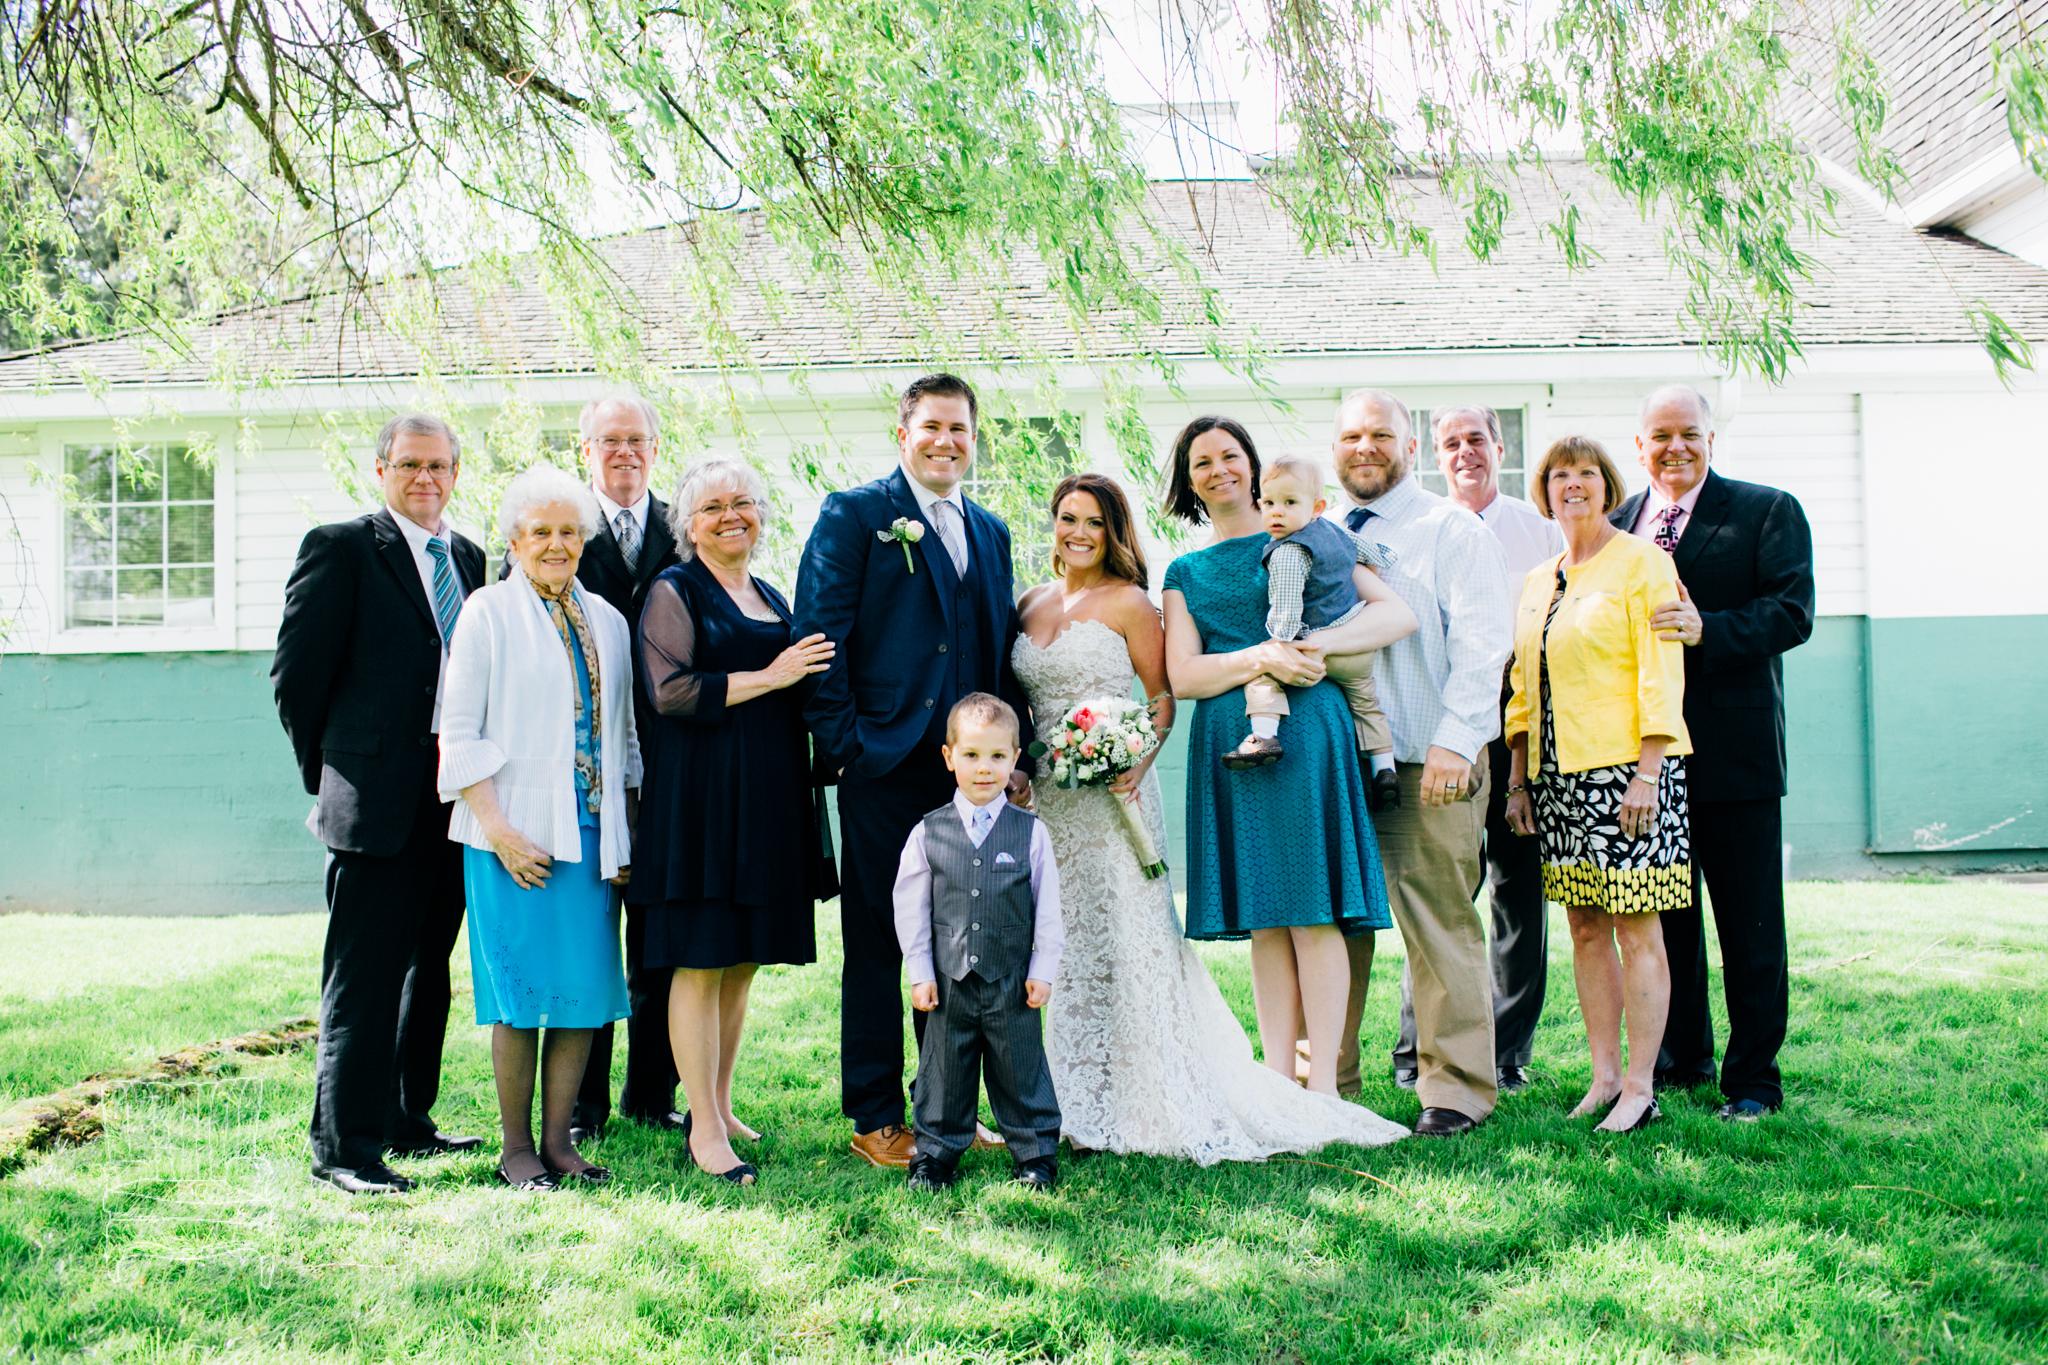 seattle-wedding-photographer-katheryn-moran-russells-bothell-wilkins-wedding-photo-33.jpg